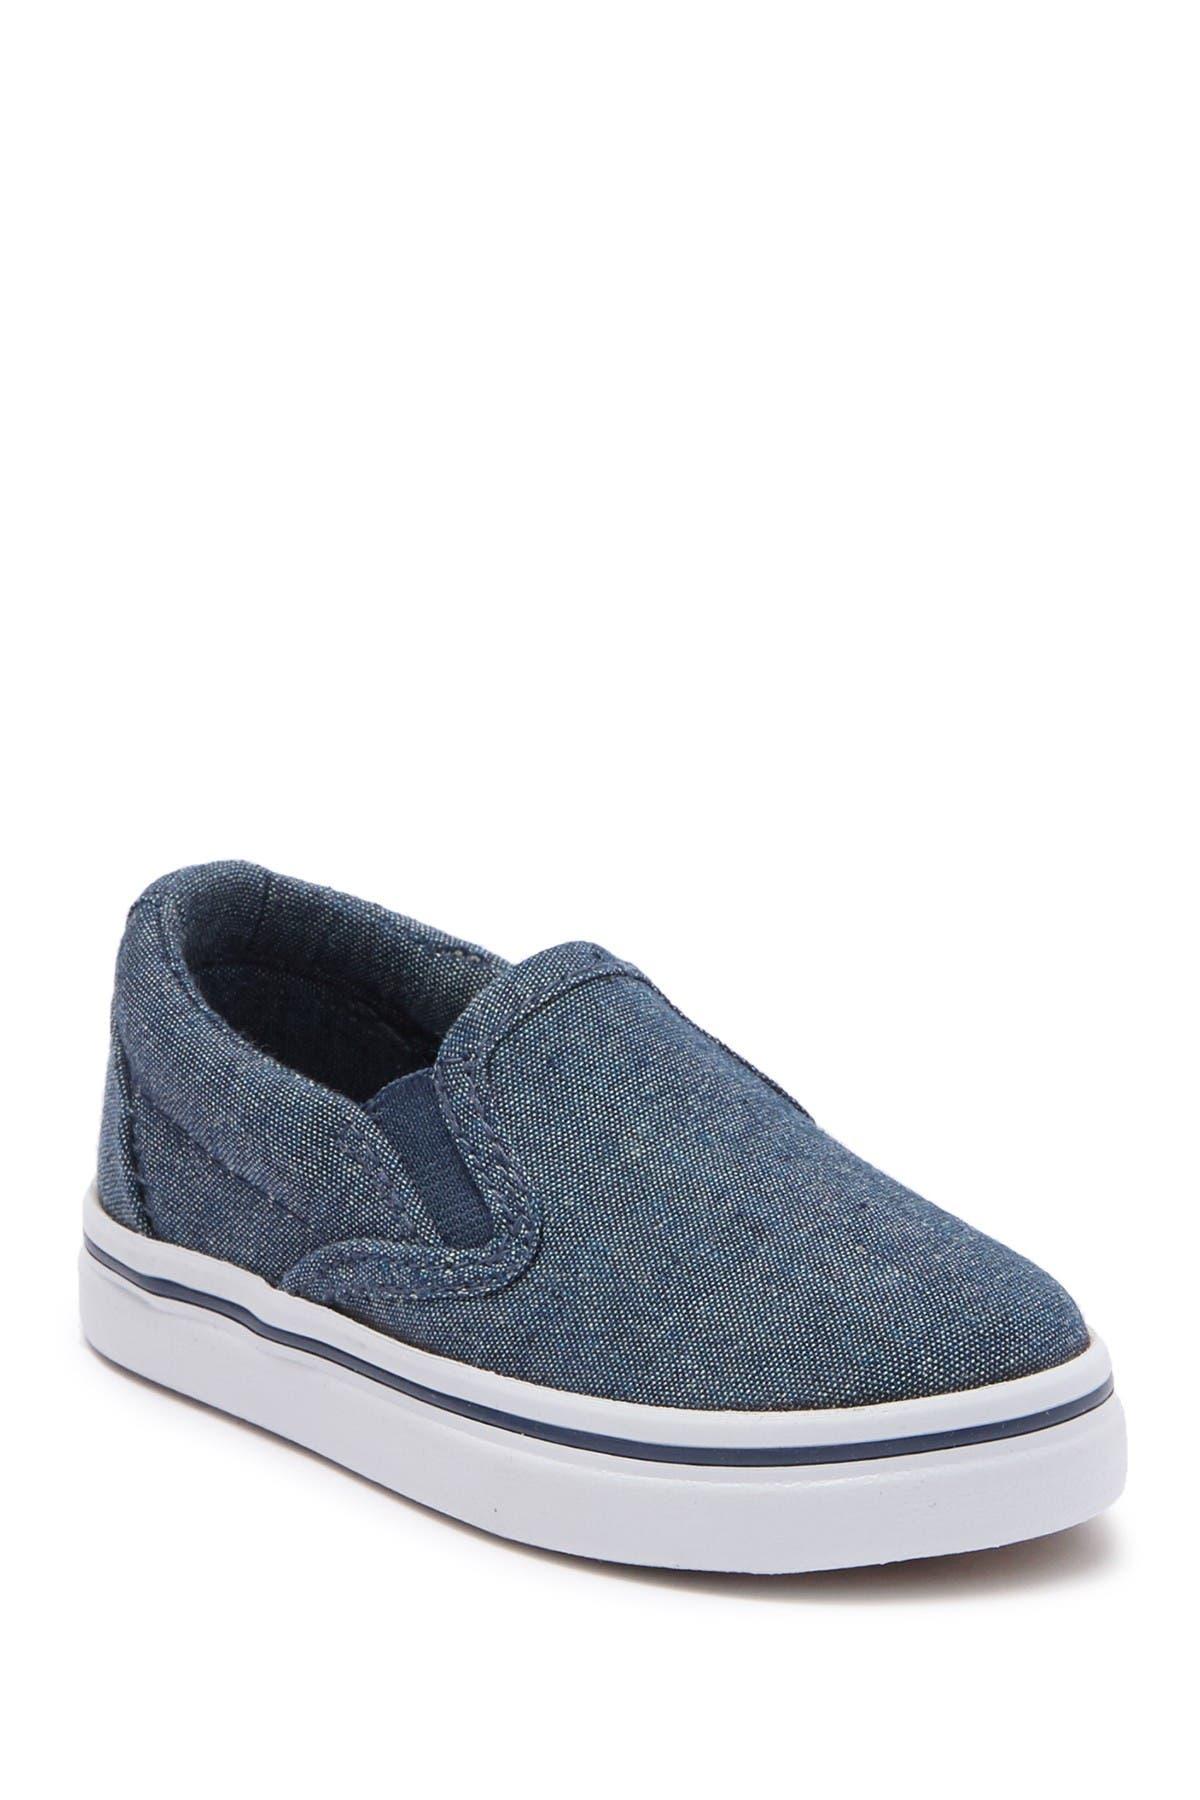 Crevo | Boonedock Slip-On Sneaker